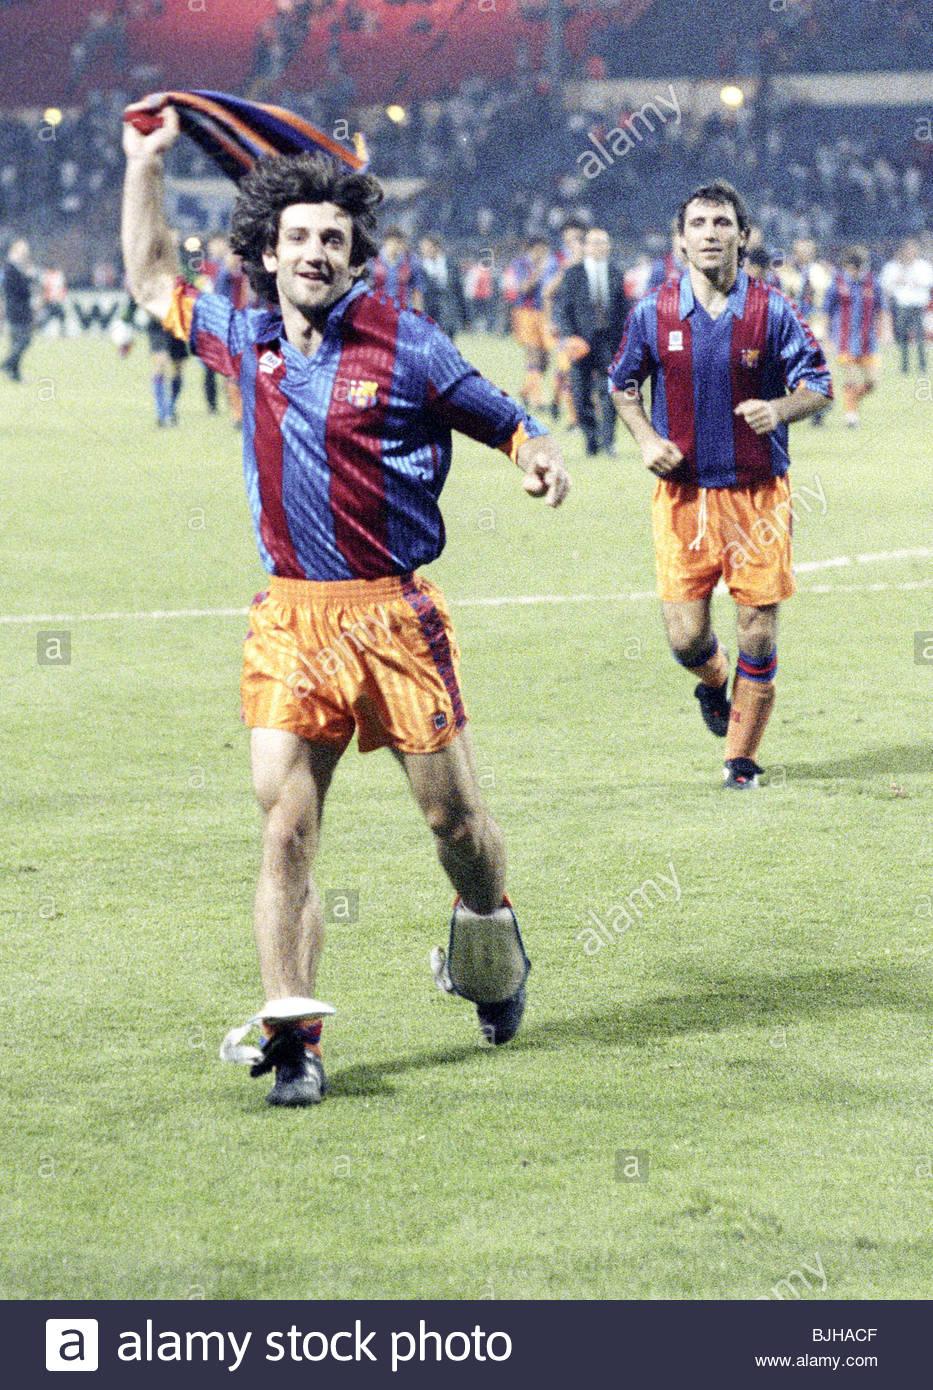 20/05/92 EUROPEAN CUP FINAL BARCELONA V SAMPDORIA (1-0) WEMBLEY - LONDON Barcelona's Jose-Maria Bakero (left) - Stock Image